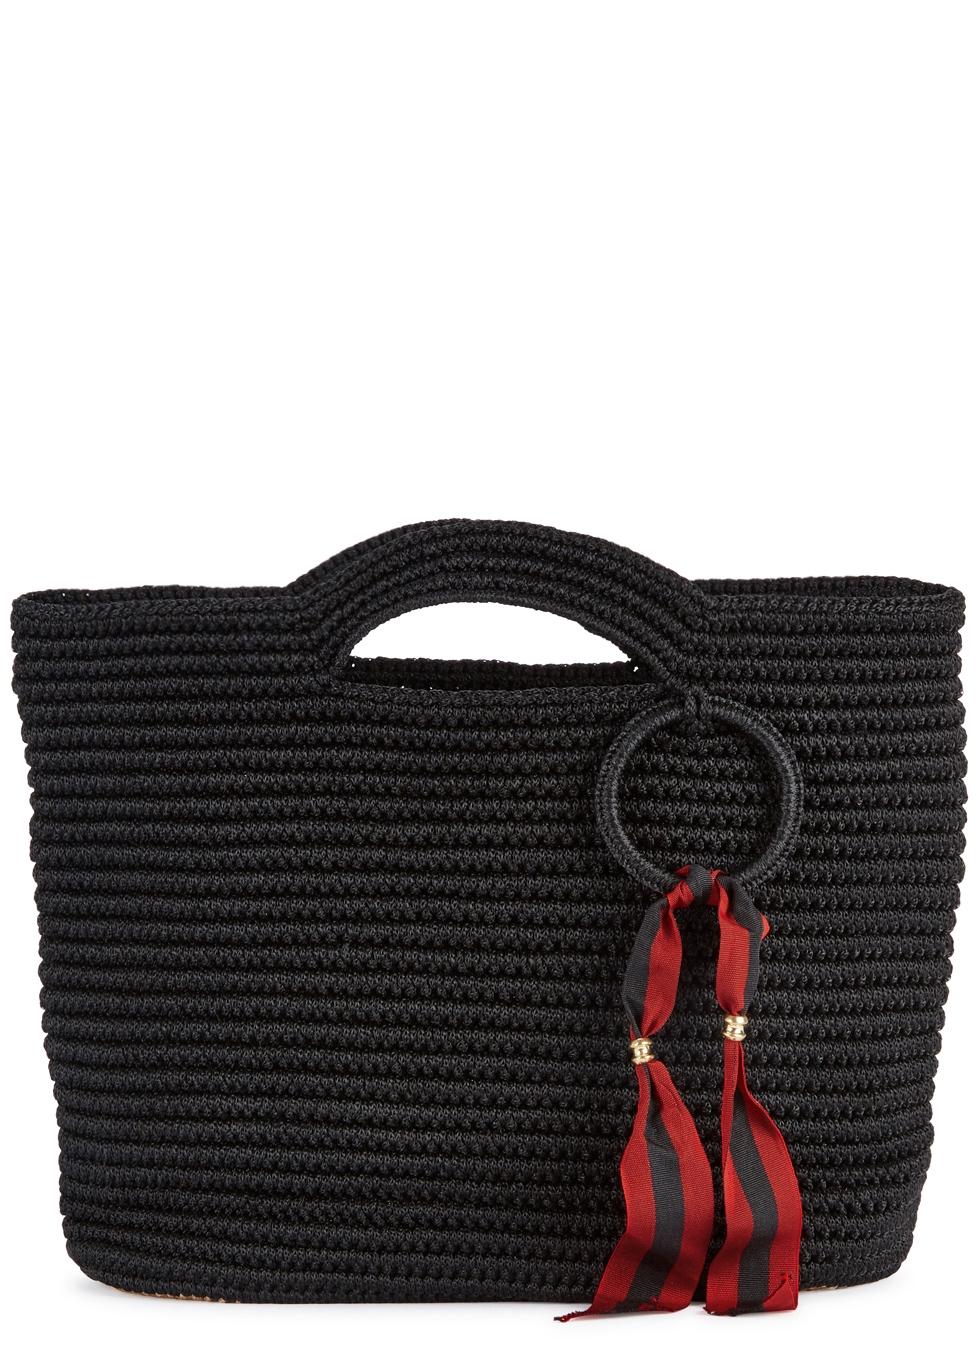 SENSI STUDIO BLACK STRAW BASKET BAG